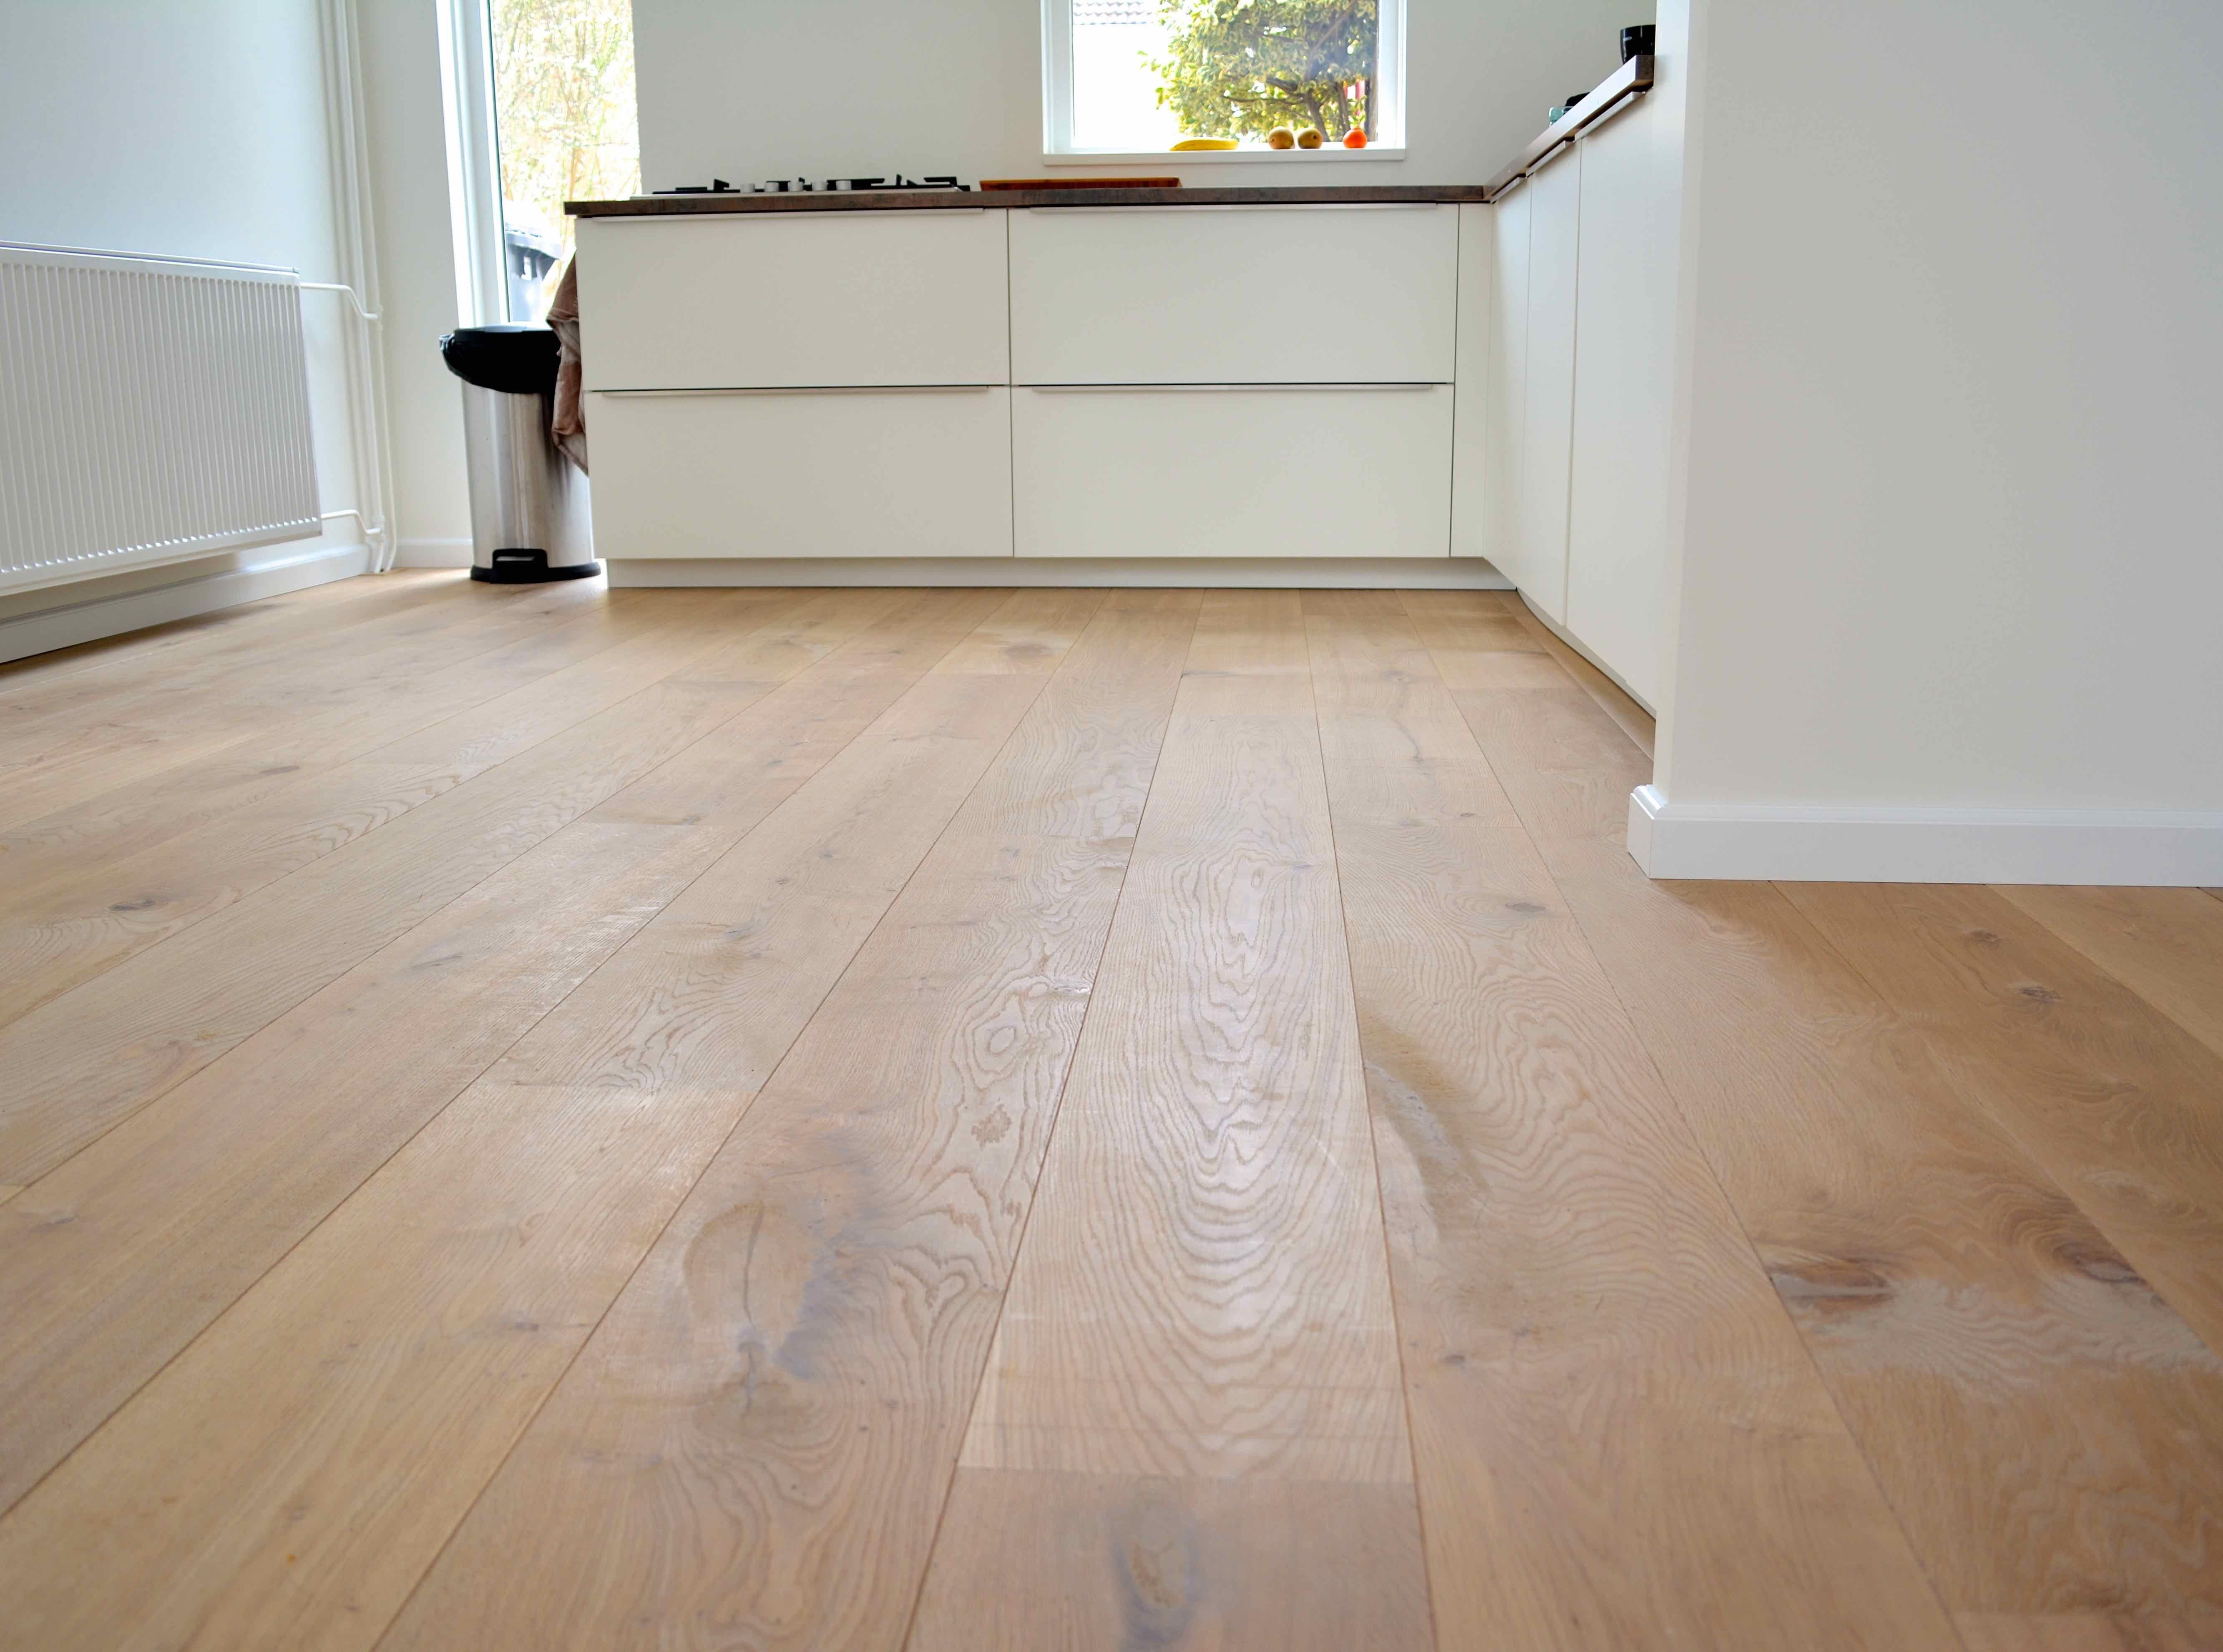 Wit dubbel gerookt eiken vloer in flooring